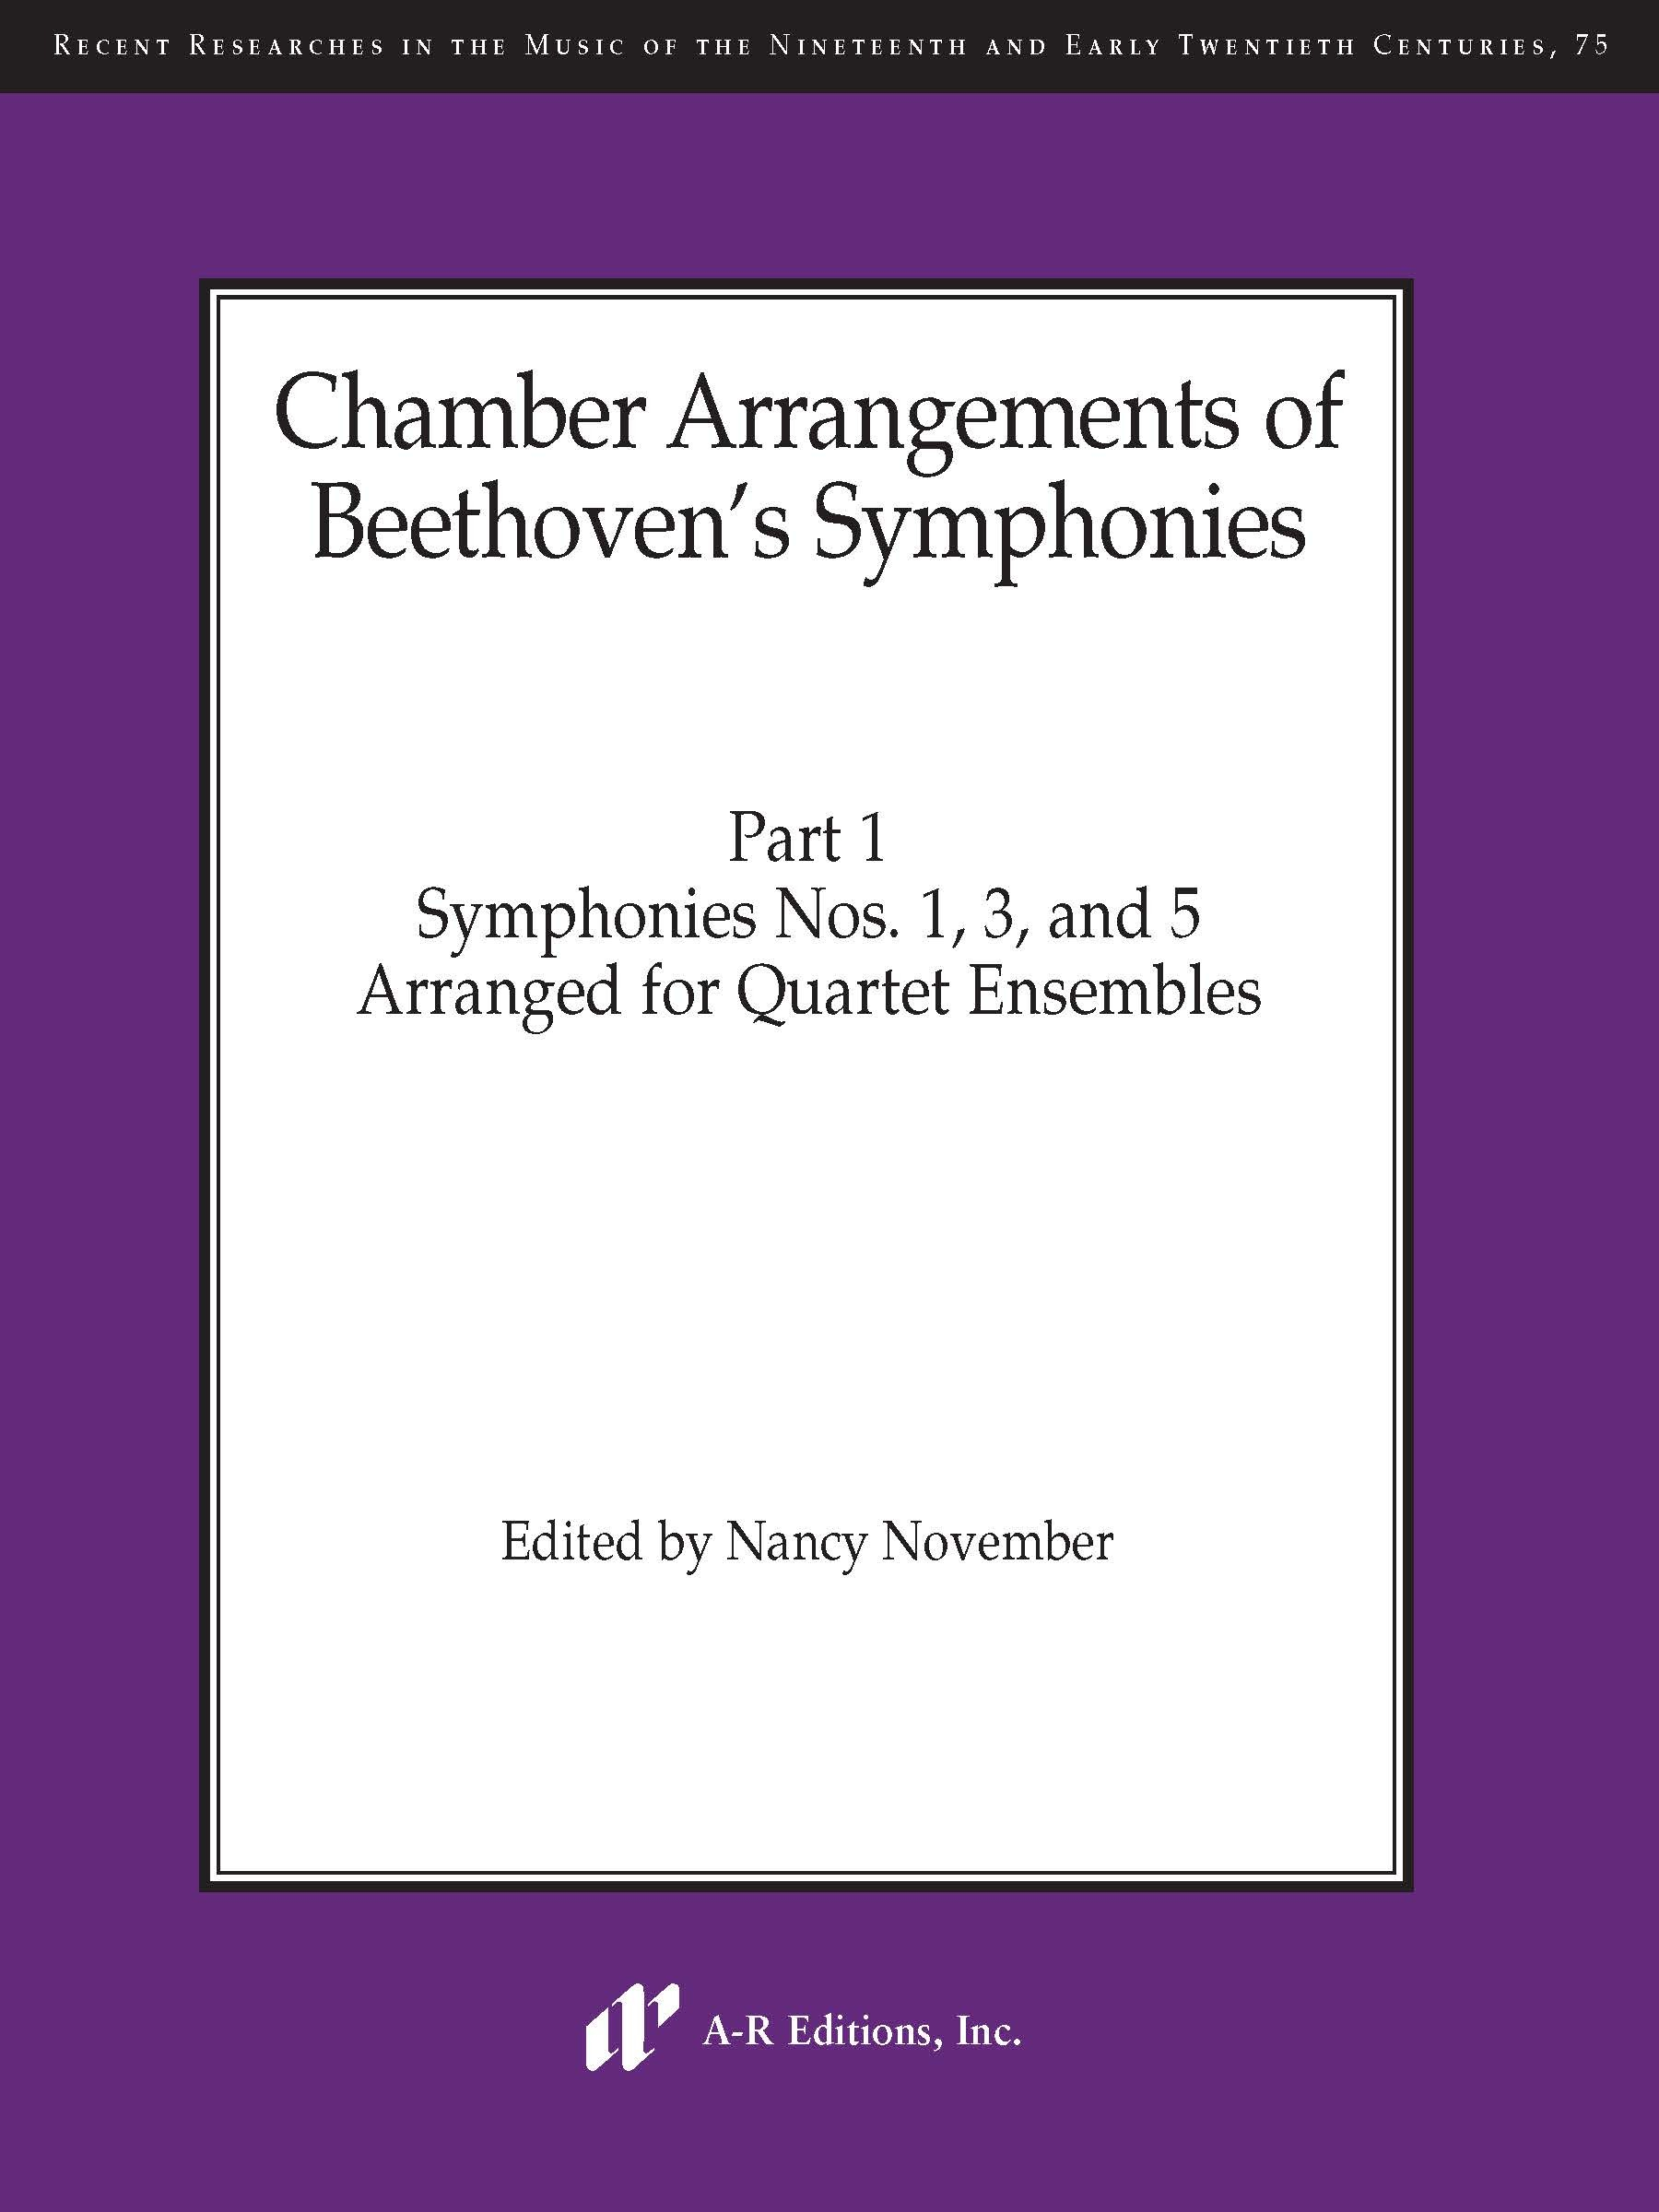 Chamber Arrangements of Beethoven's Symphonies